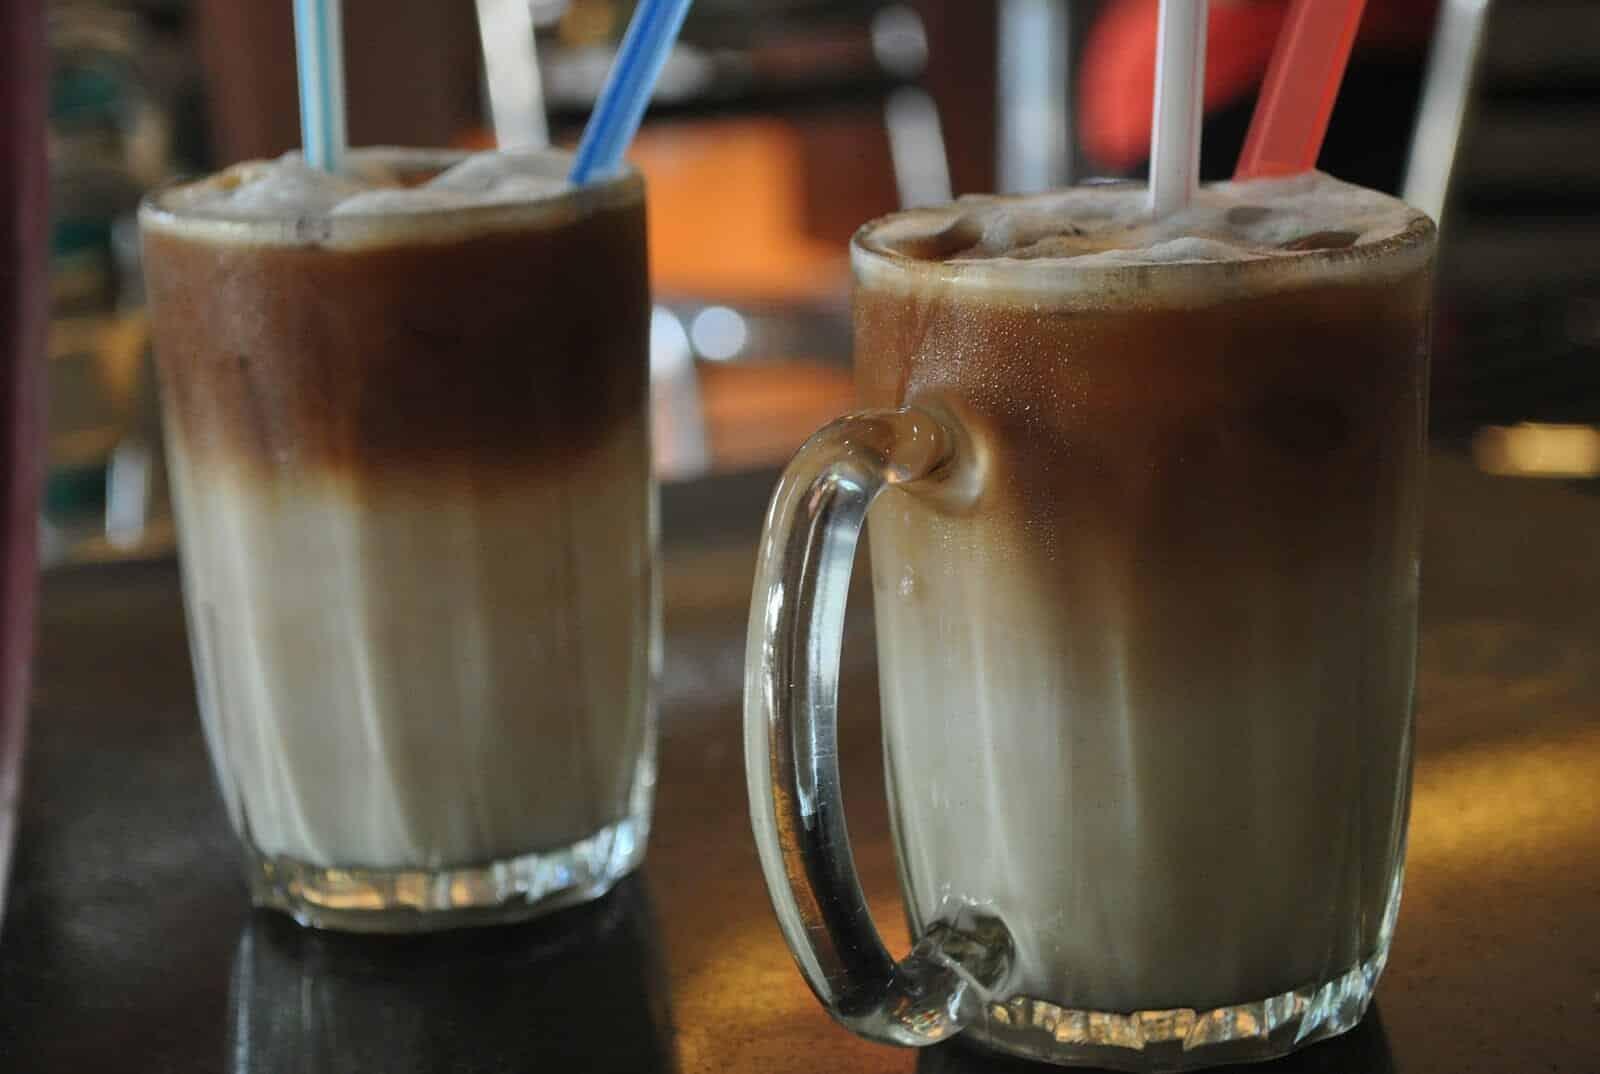 Ais kopi cham ijskoffie